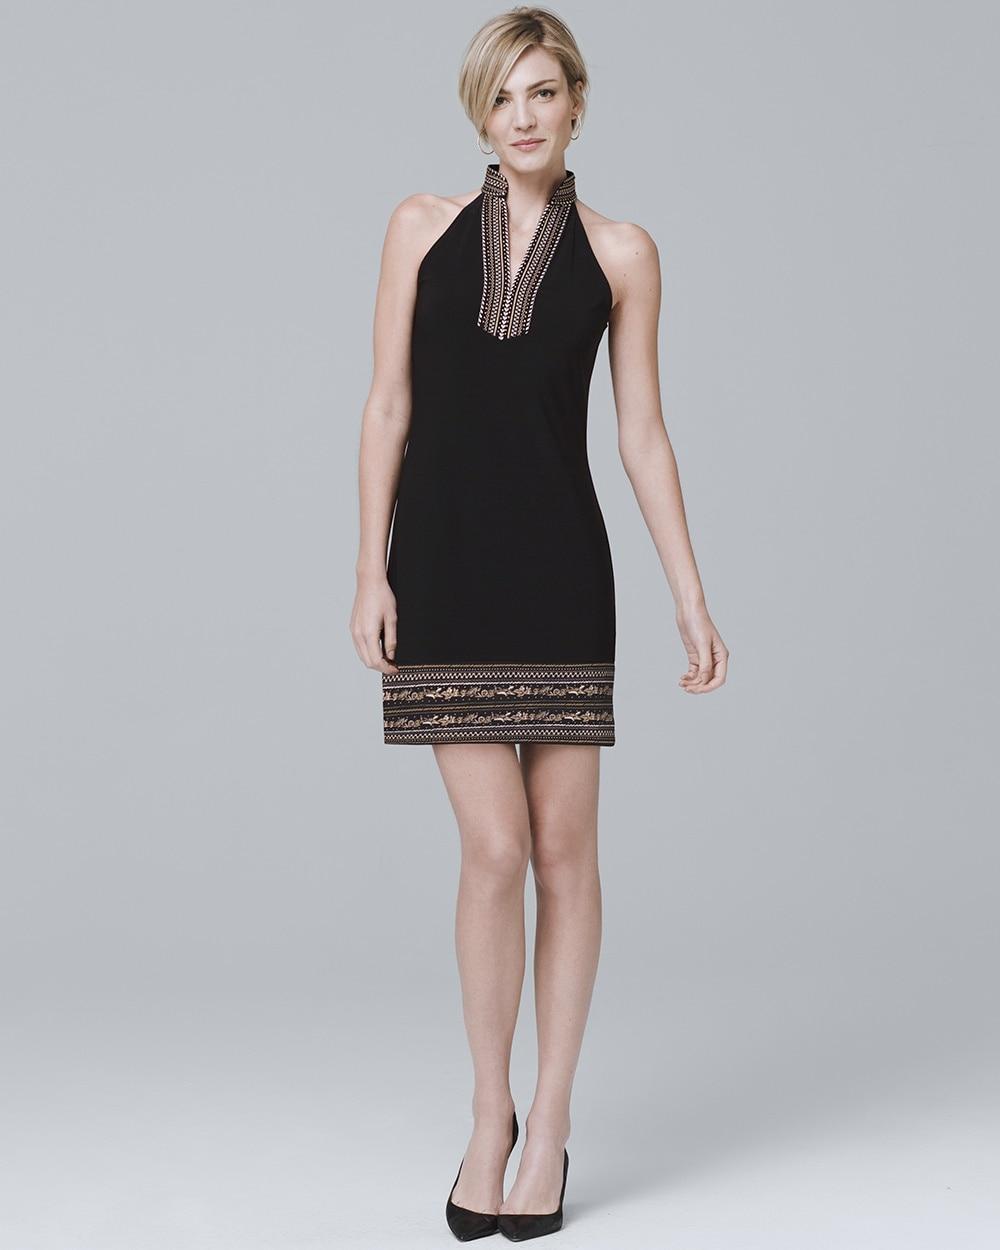 10896fd28d0 Sleeveless Embellished-Knit Shift Dress - White House Black Market